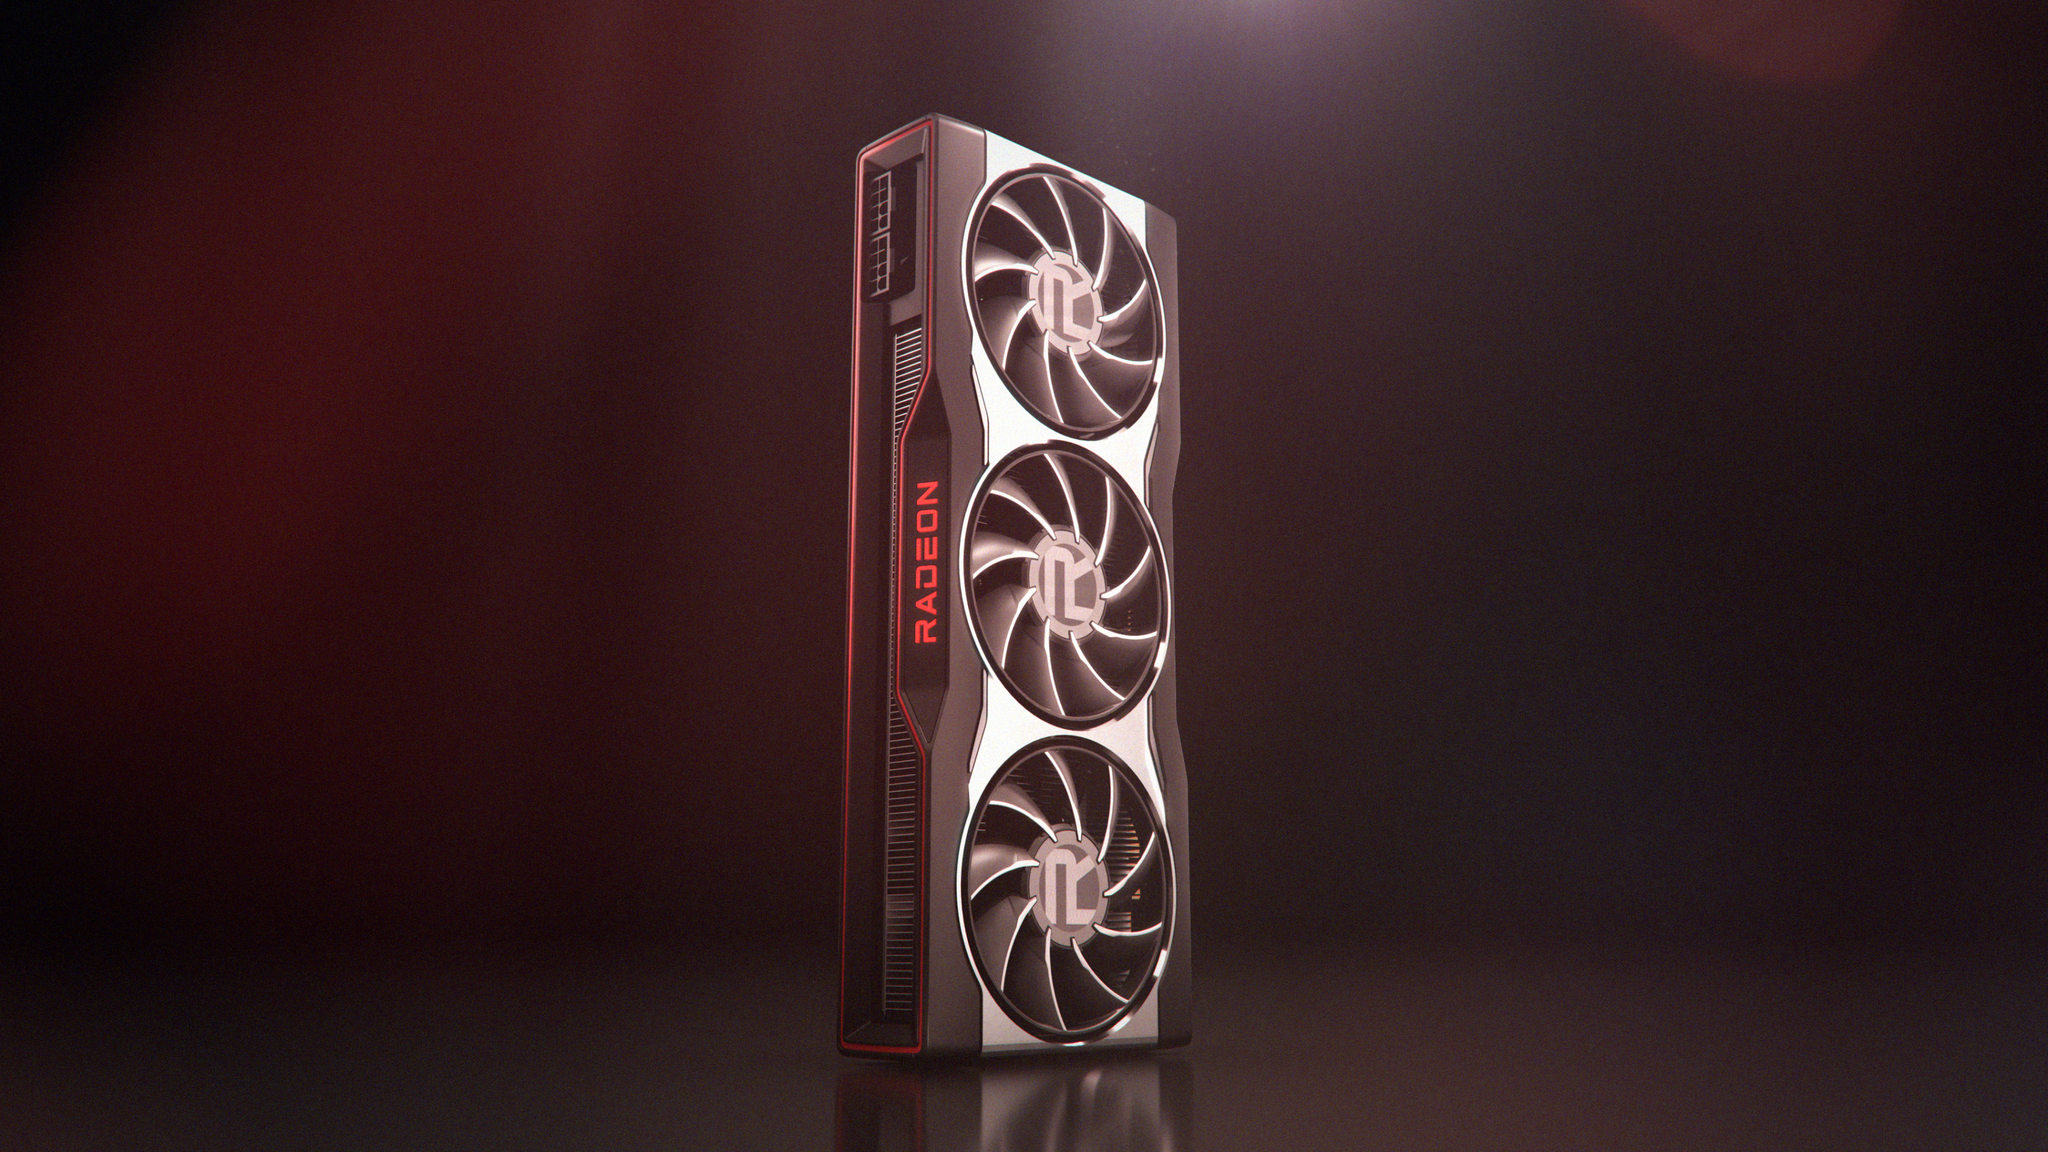 Her er AMDs svar på Nvidias RTX 30-serie